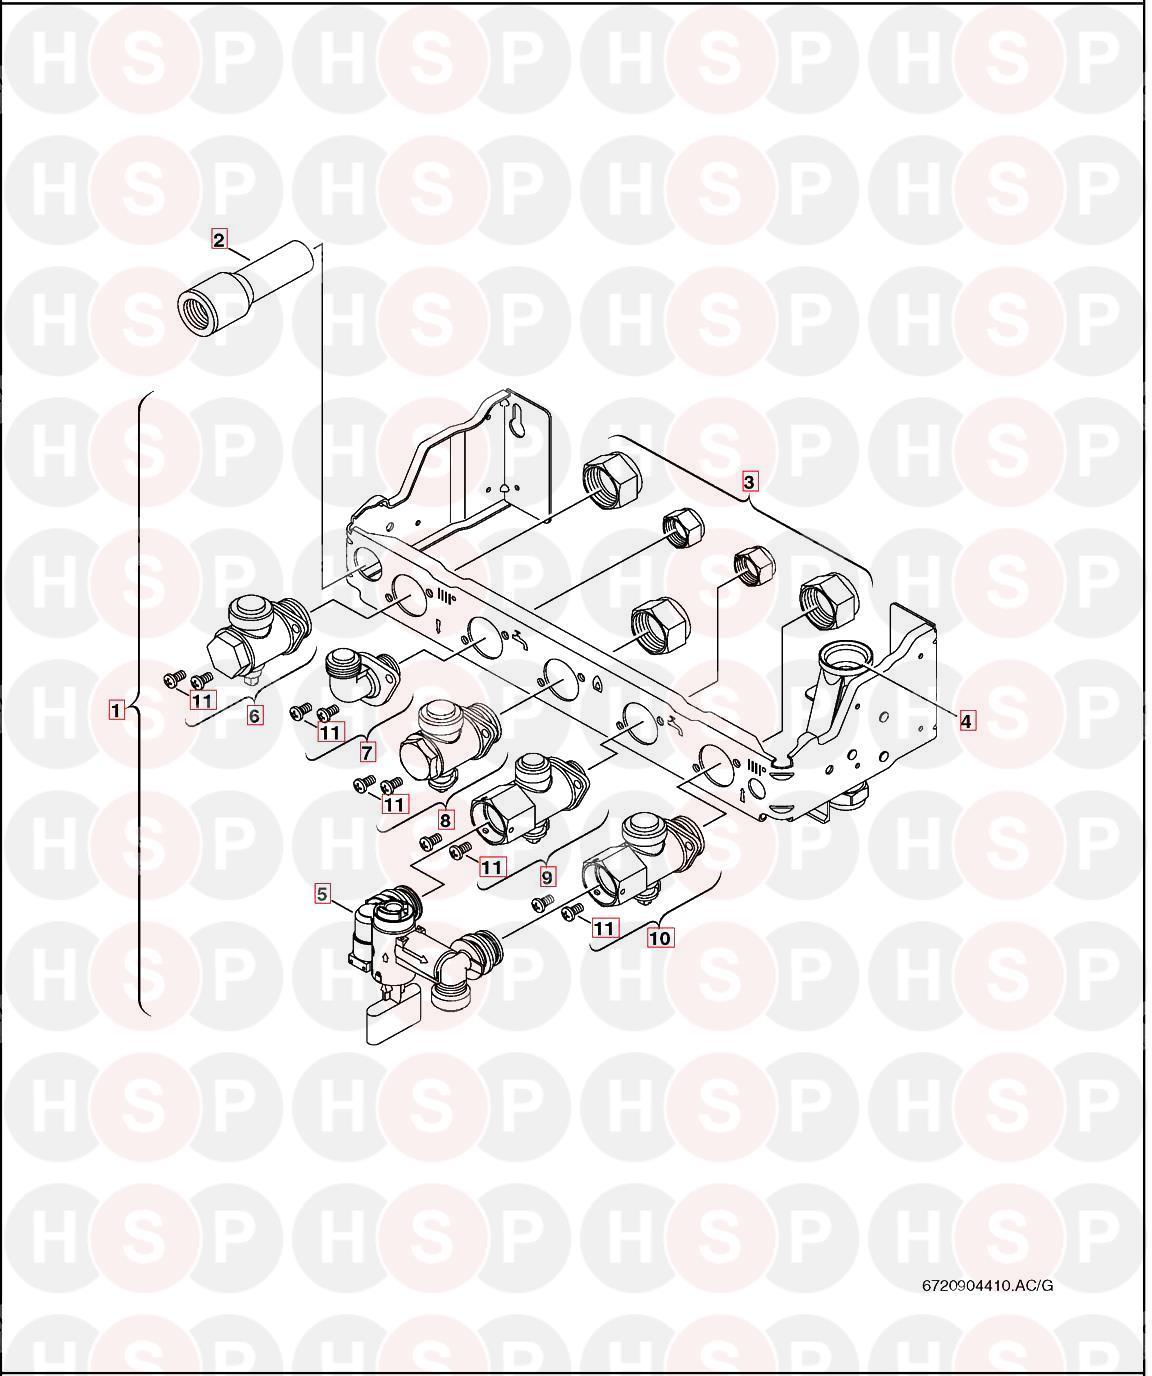 Worcester GREENSTAR 38CDI CLASSIC Appliance Diagram